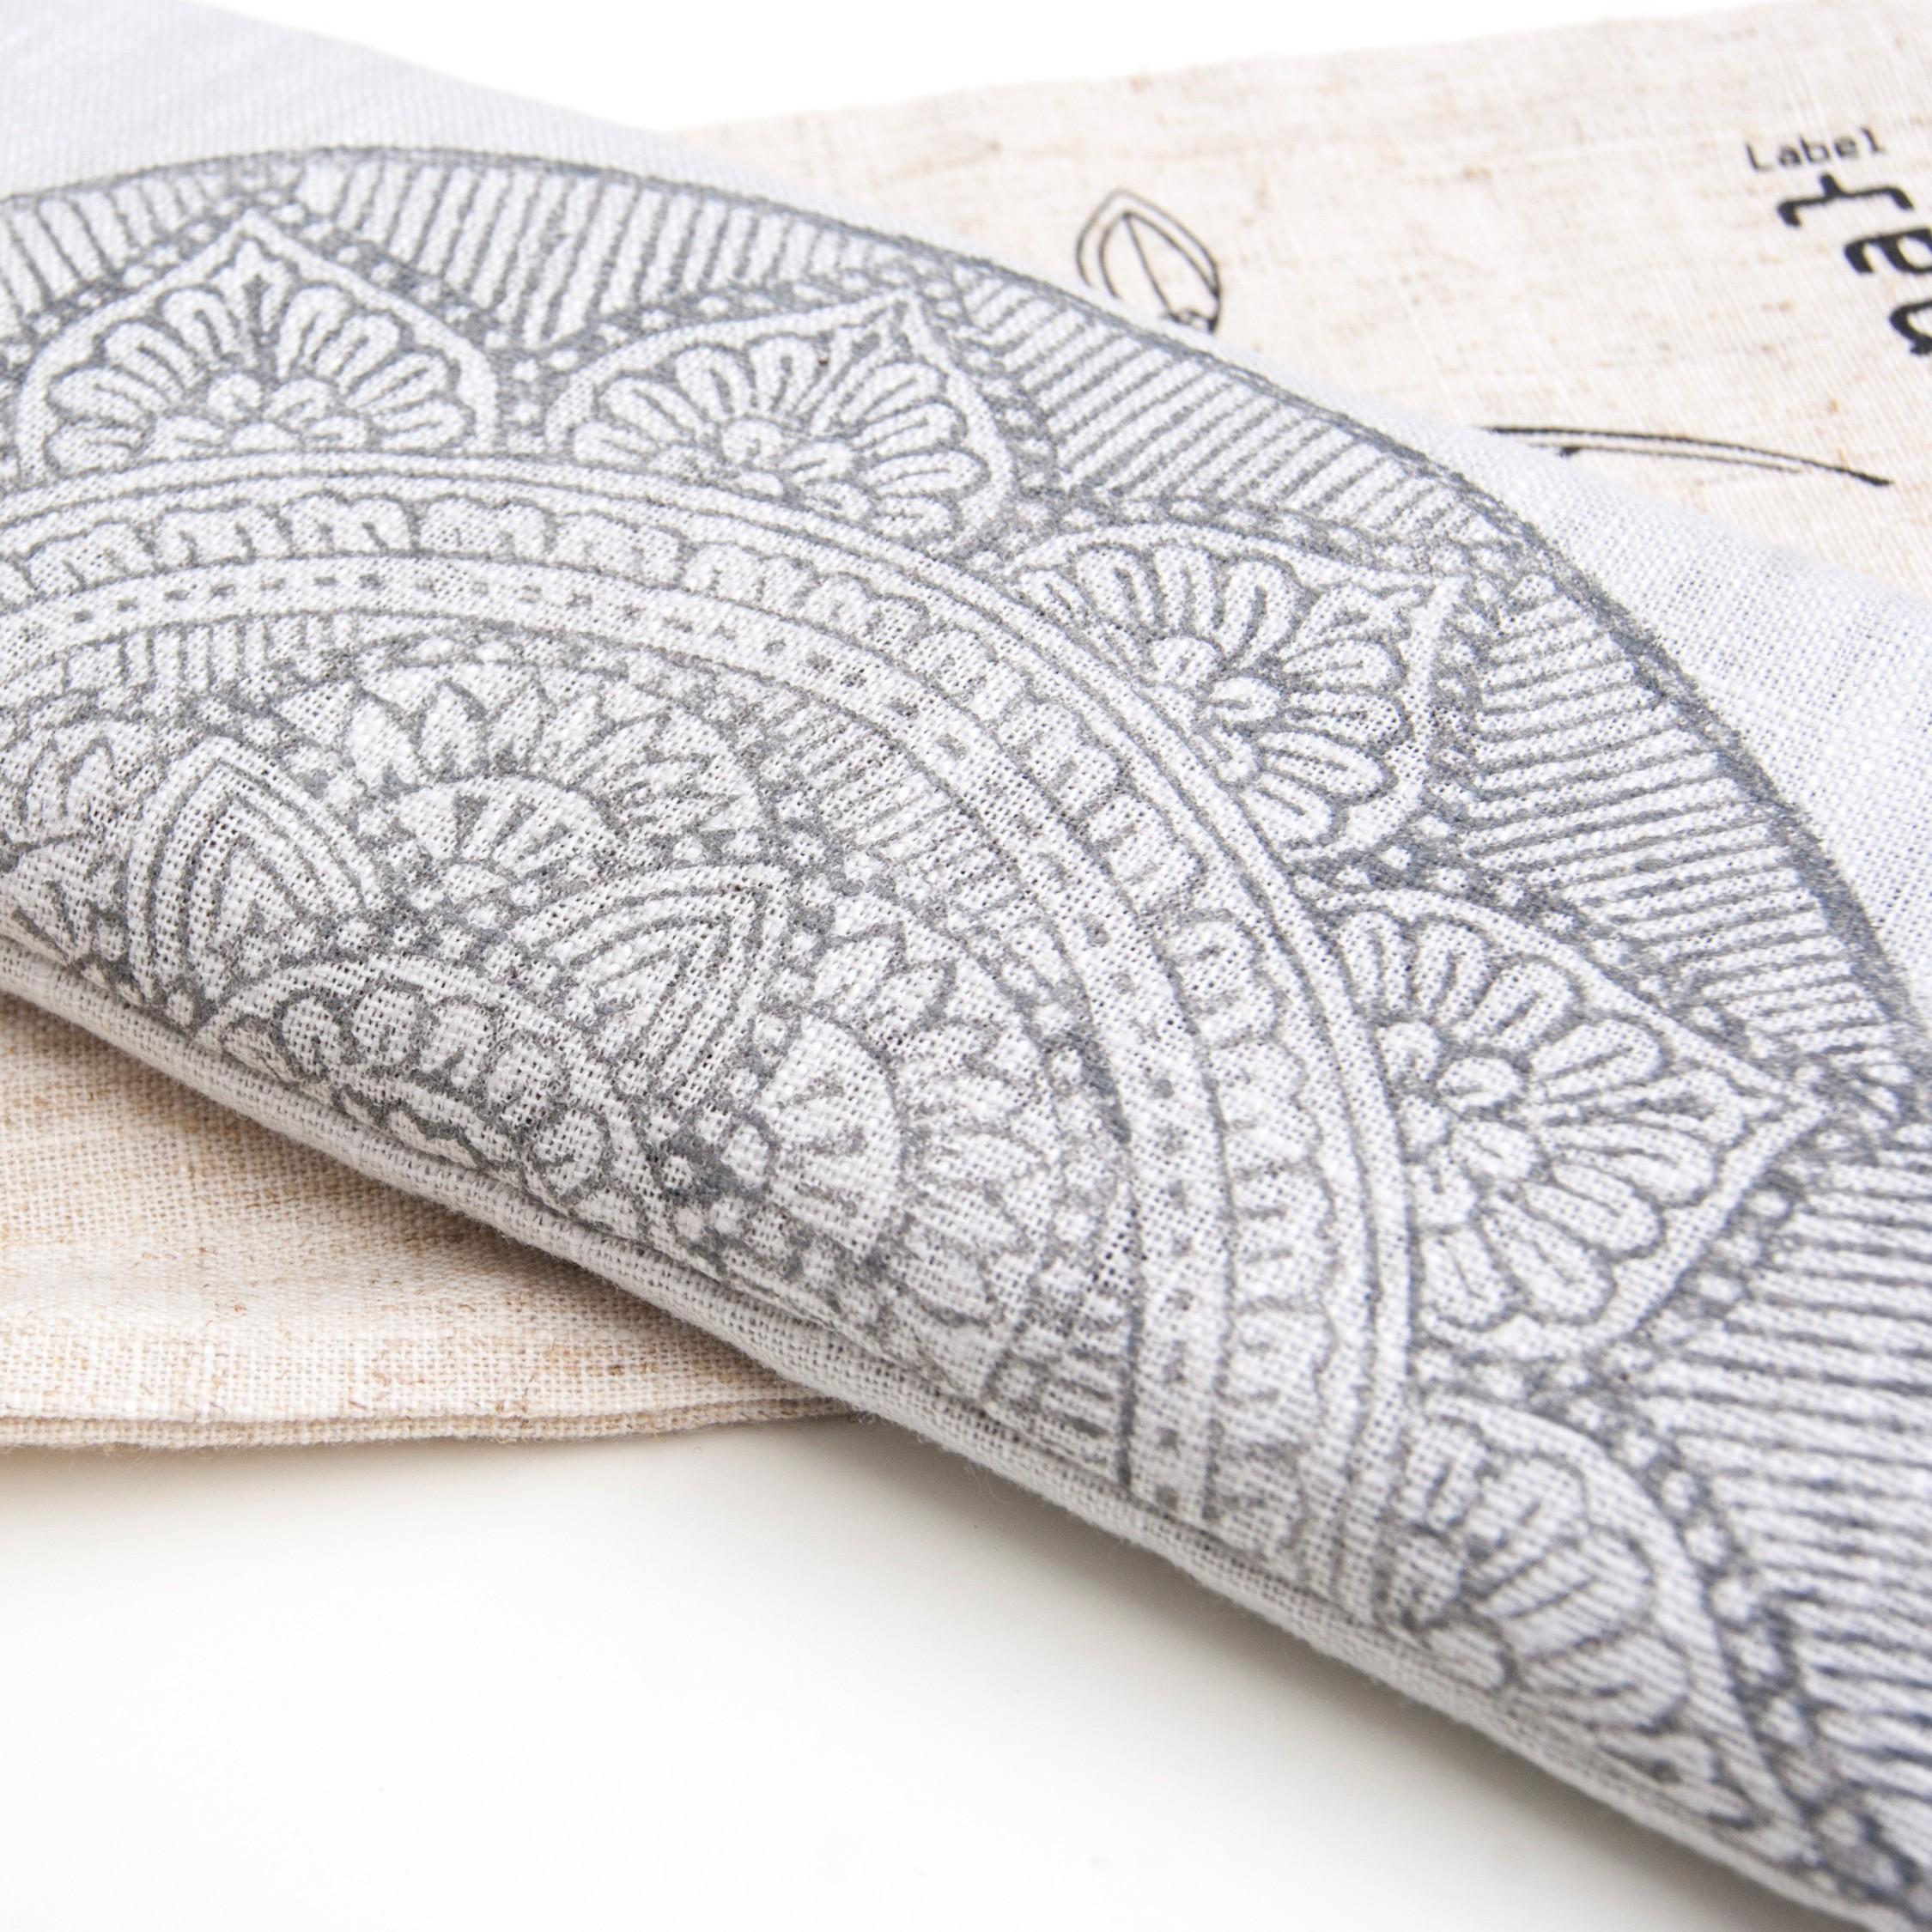 Mandala print on eye pillow by Pure Prana Label